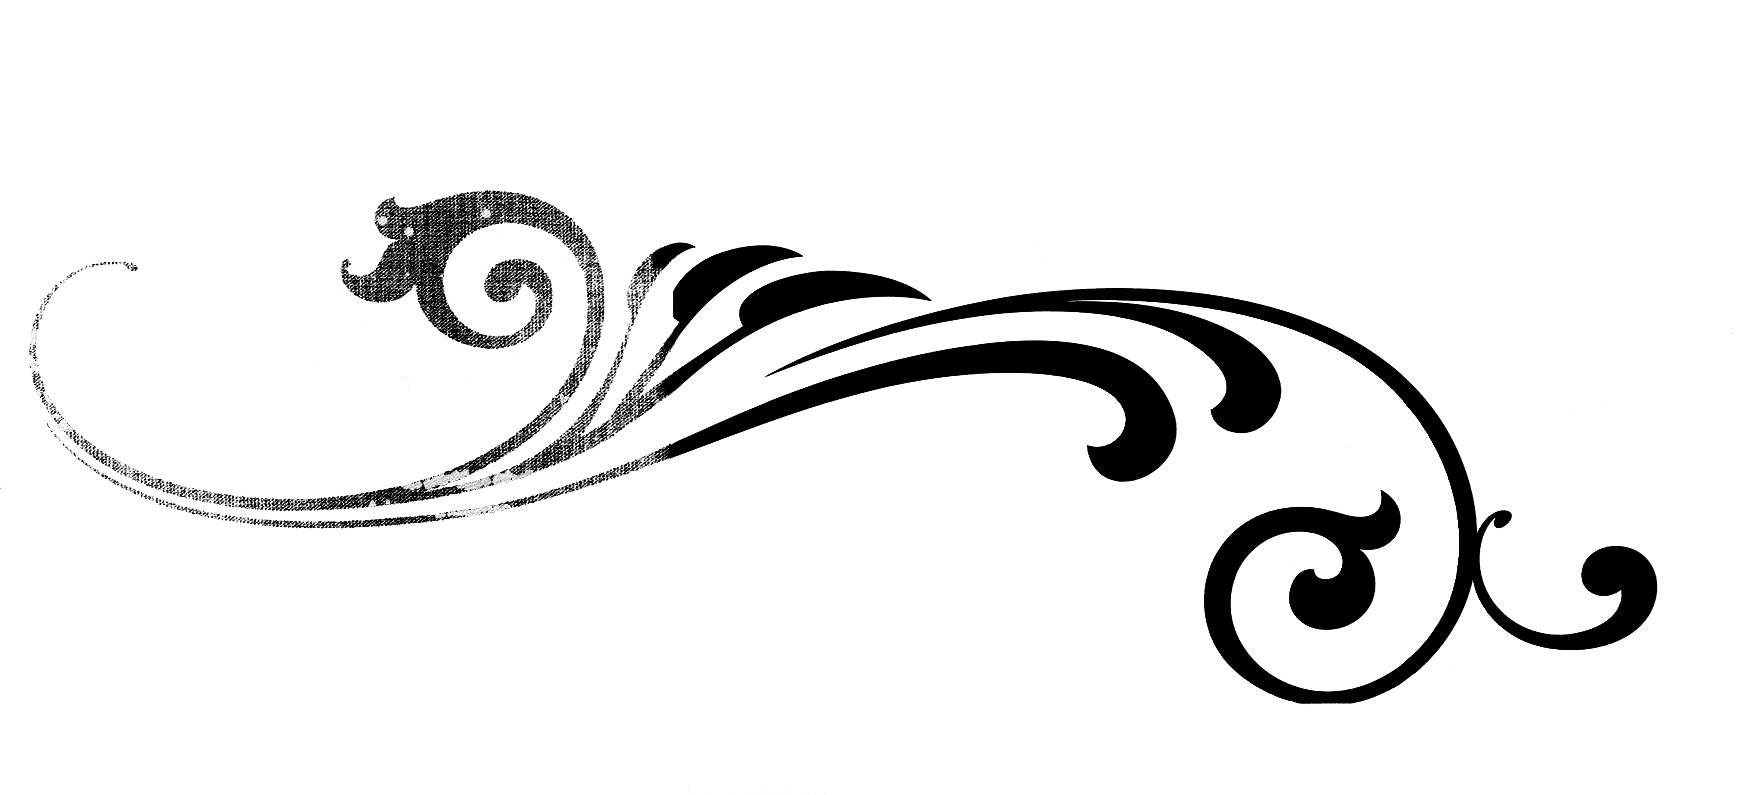 1747x795 Drywall Logos Clipart 2008456